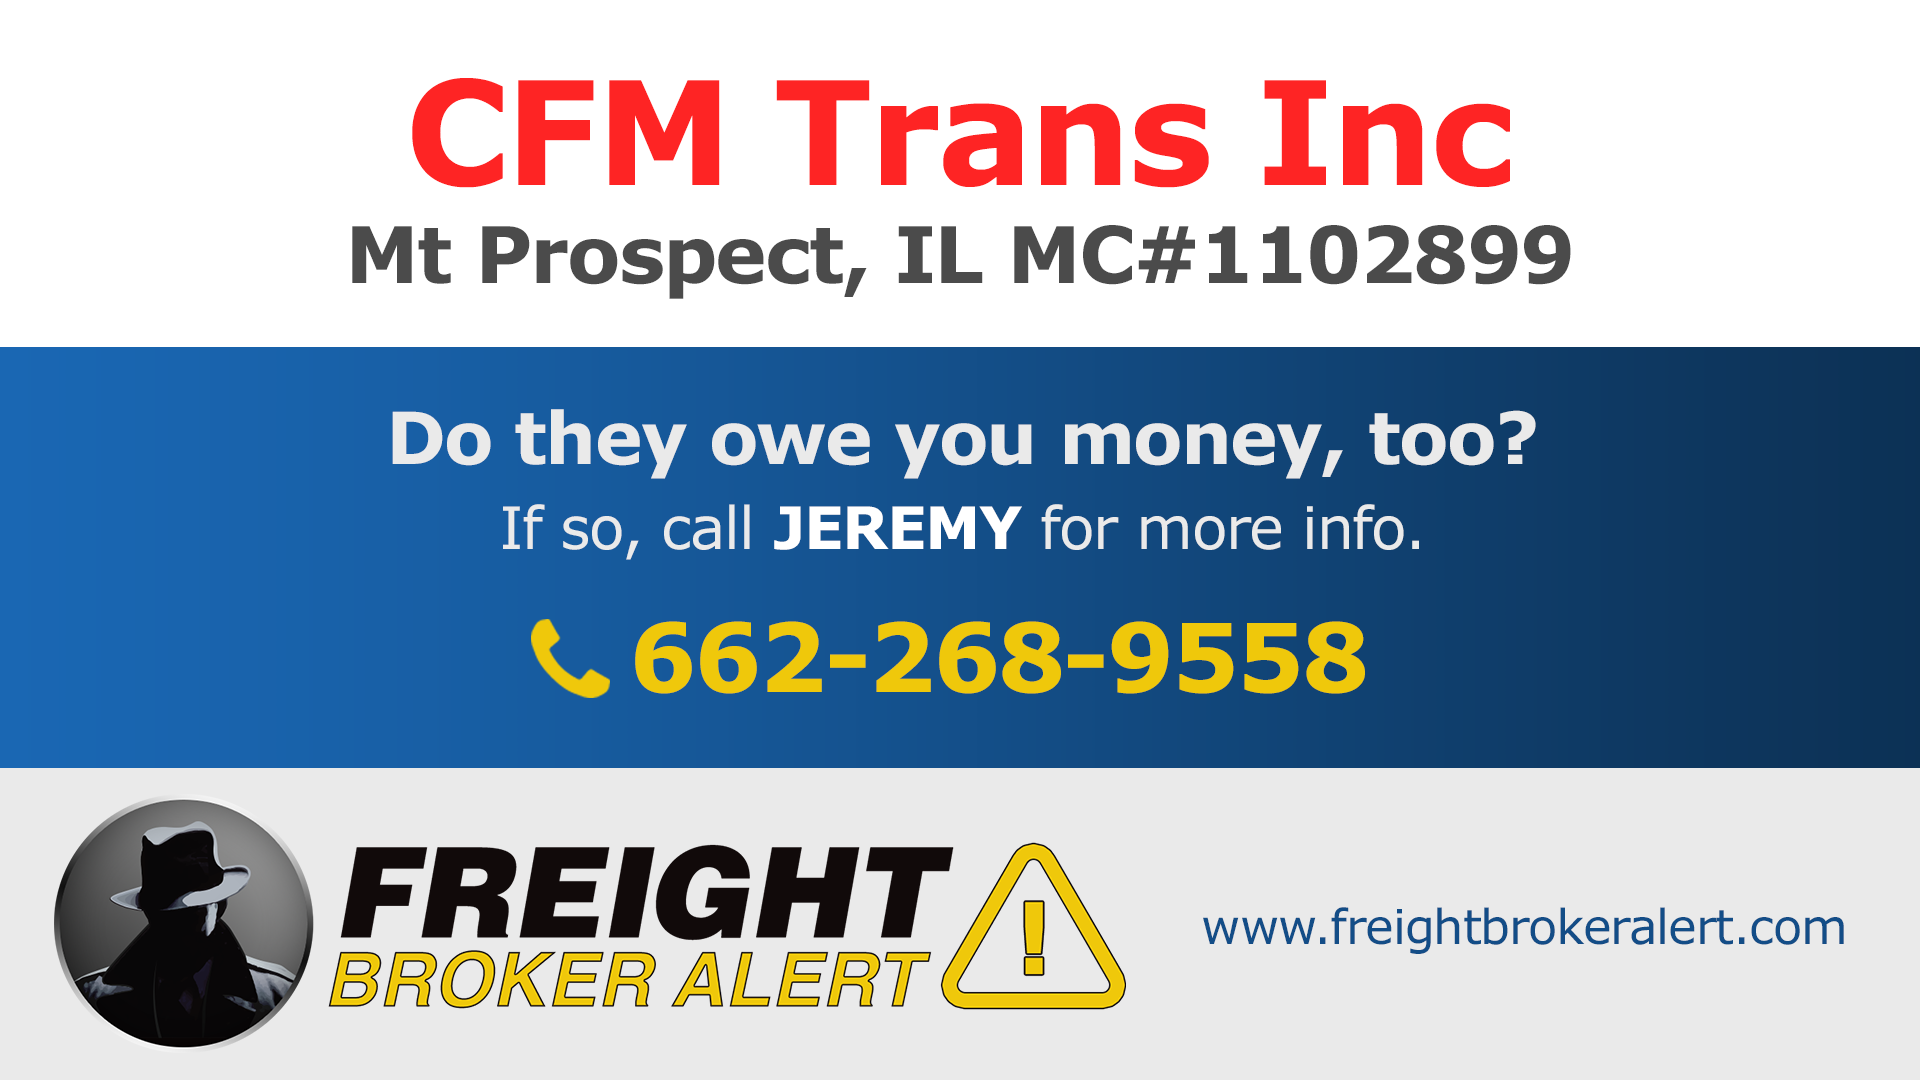 CFM Trans Inc Illinois